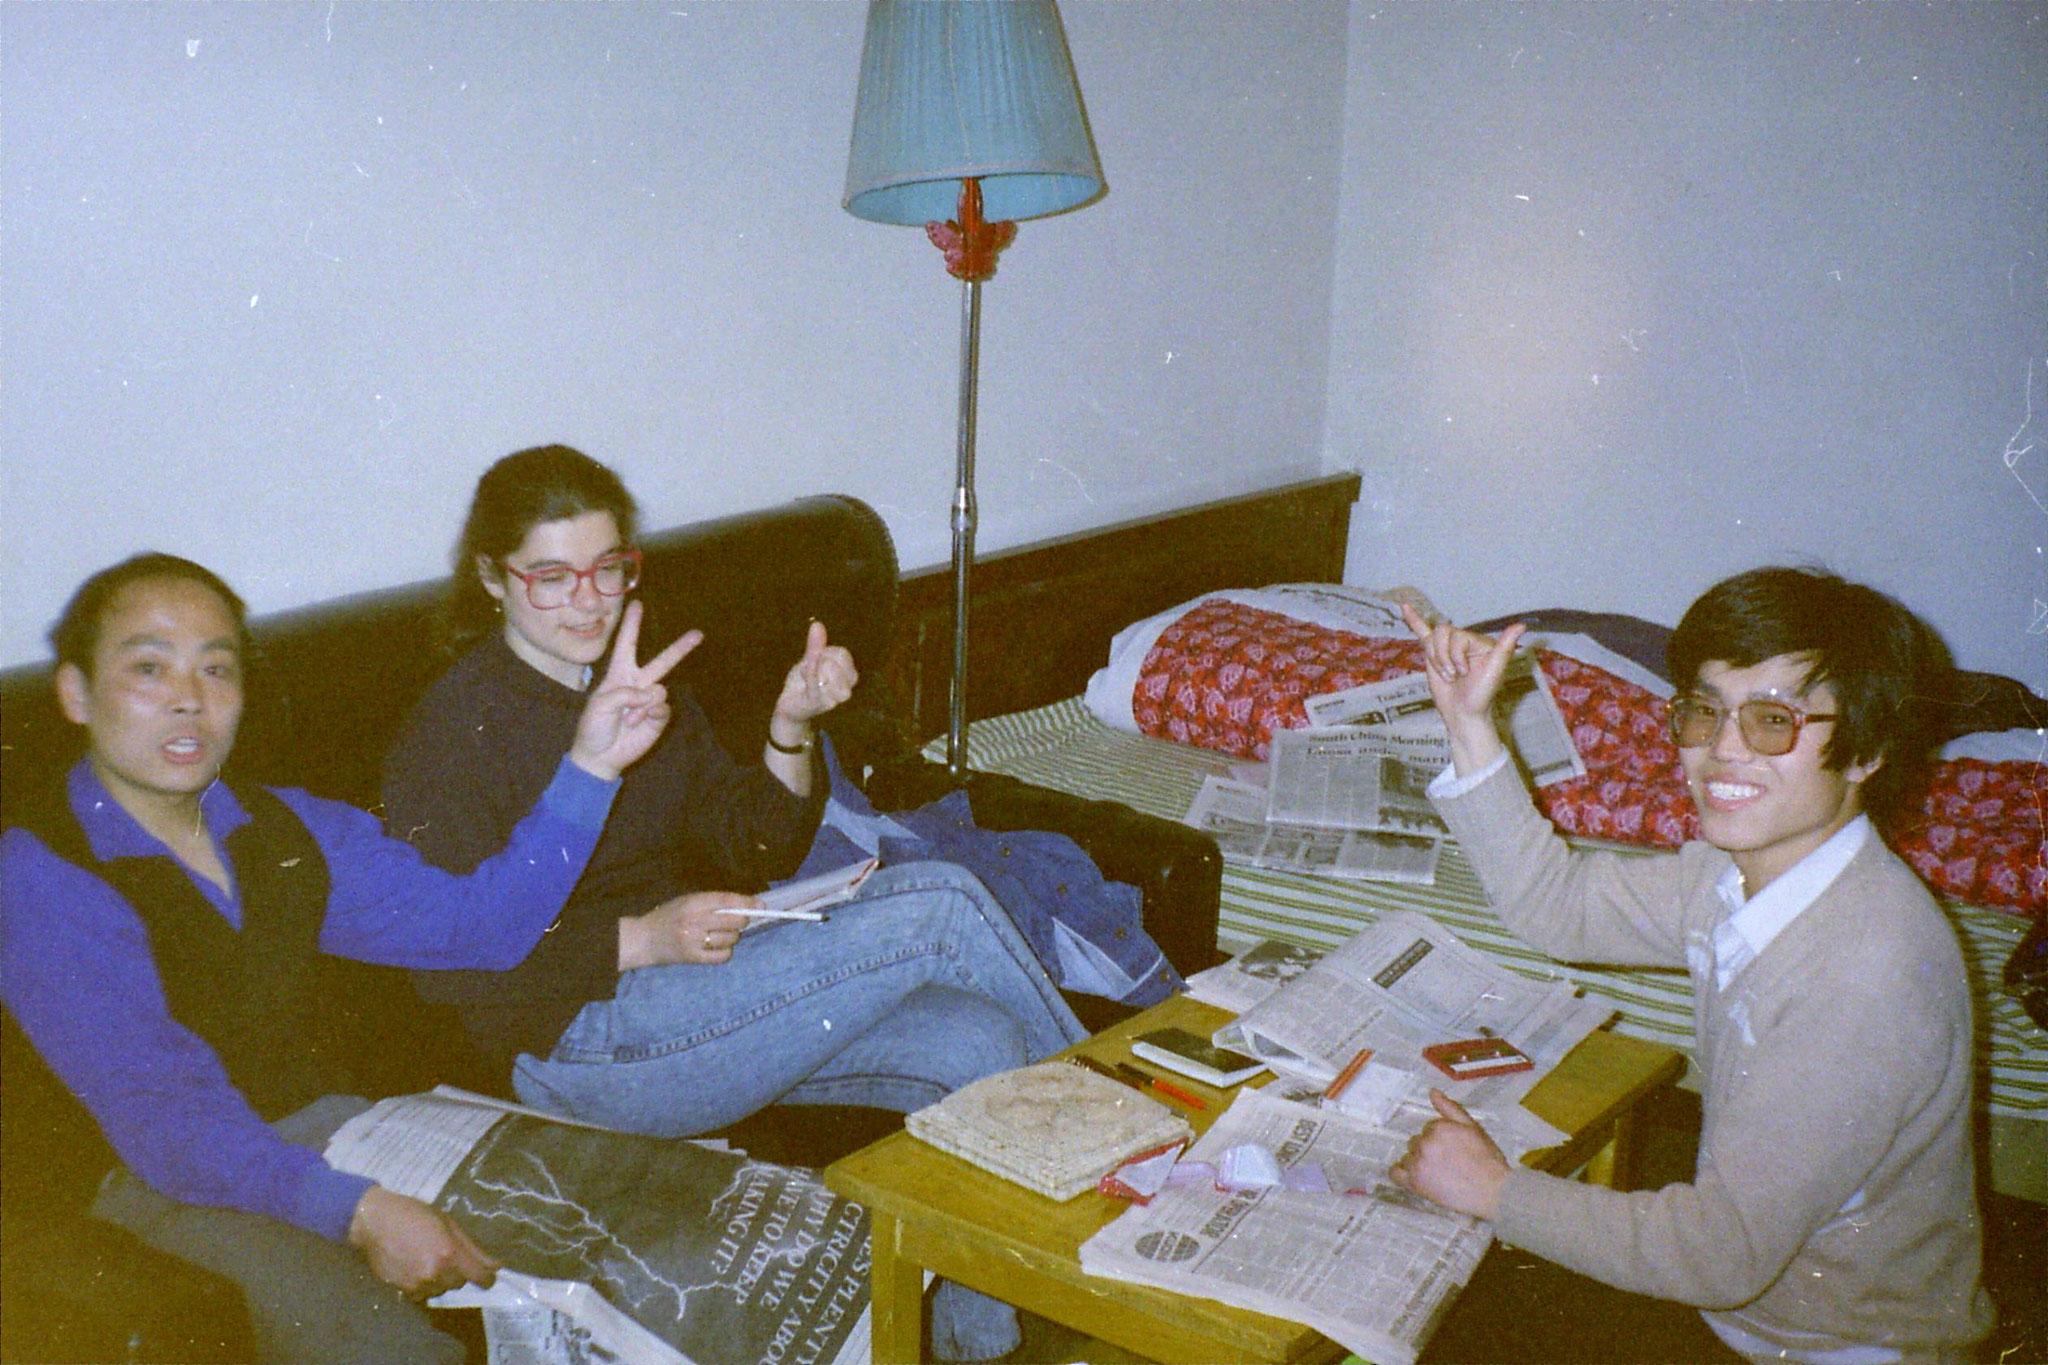 12/3/1989: 24: Yeh Jing Tow's flat in Beijing